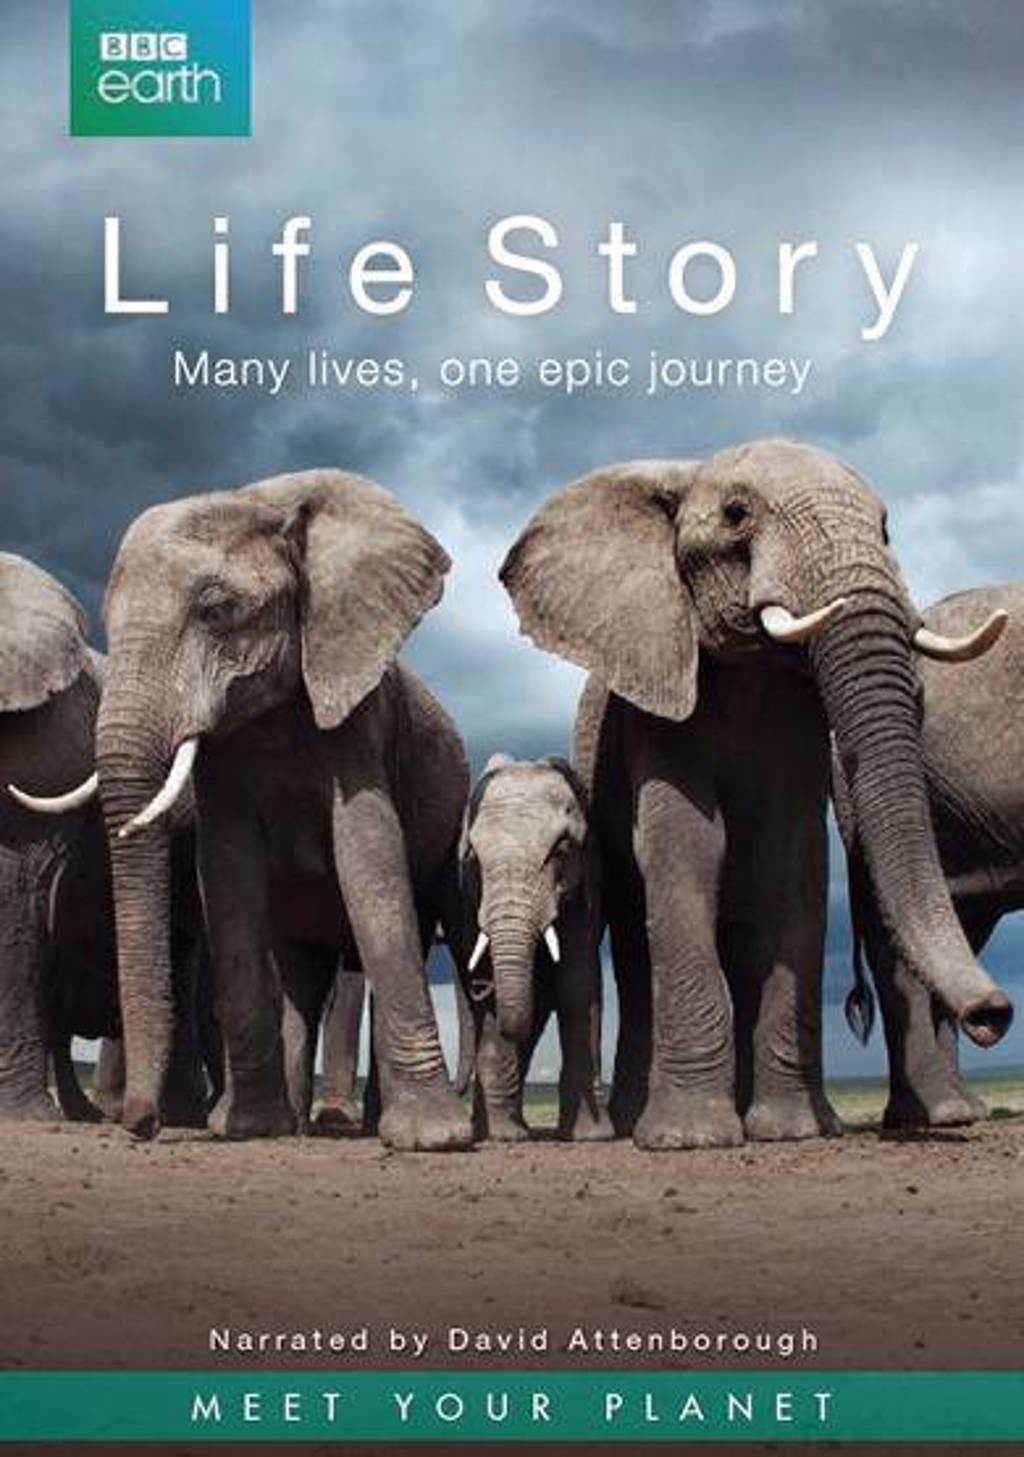 BBC earth - Life story (DVD)